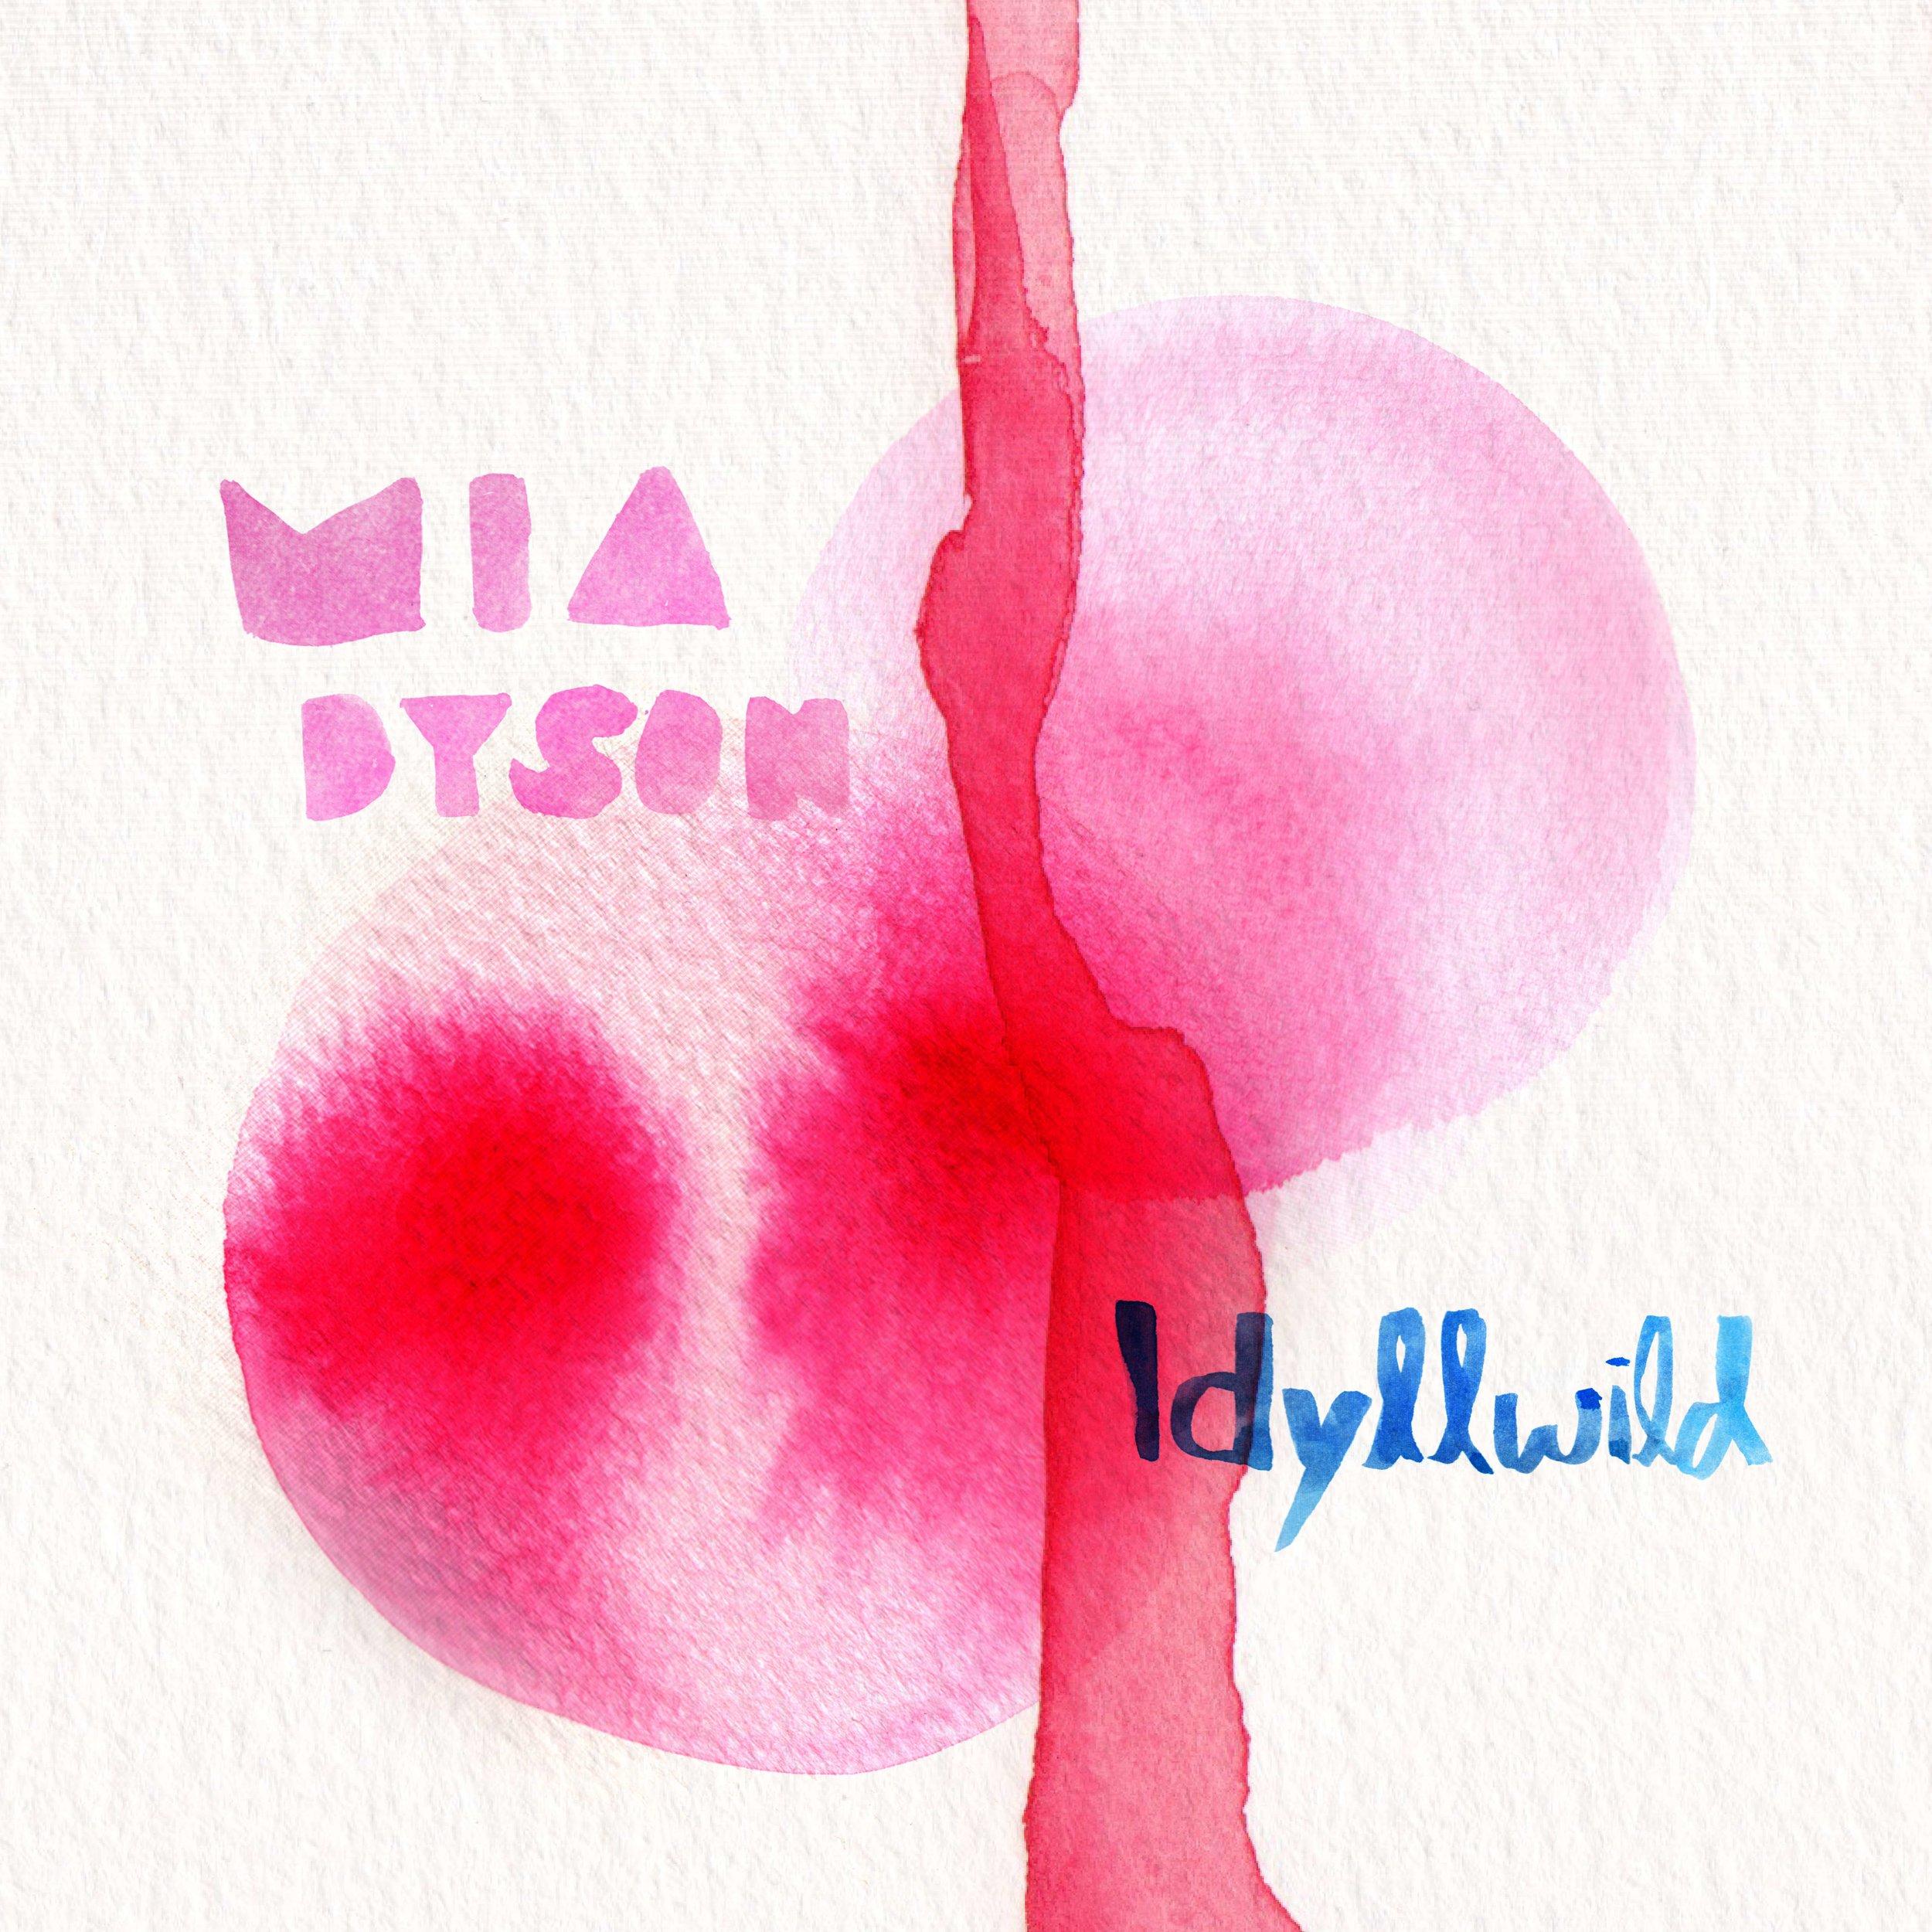 Mia Dyson  Idyllwild Black Door / MGM (2014)